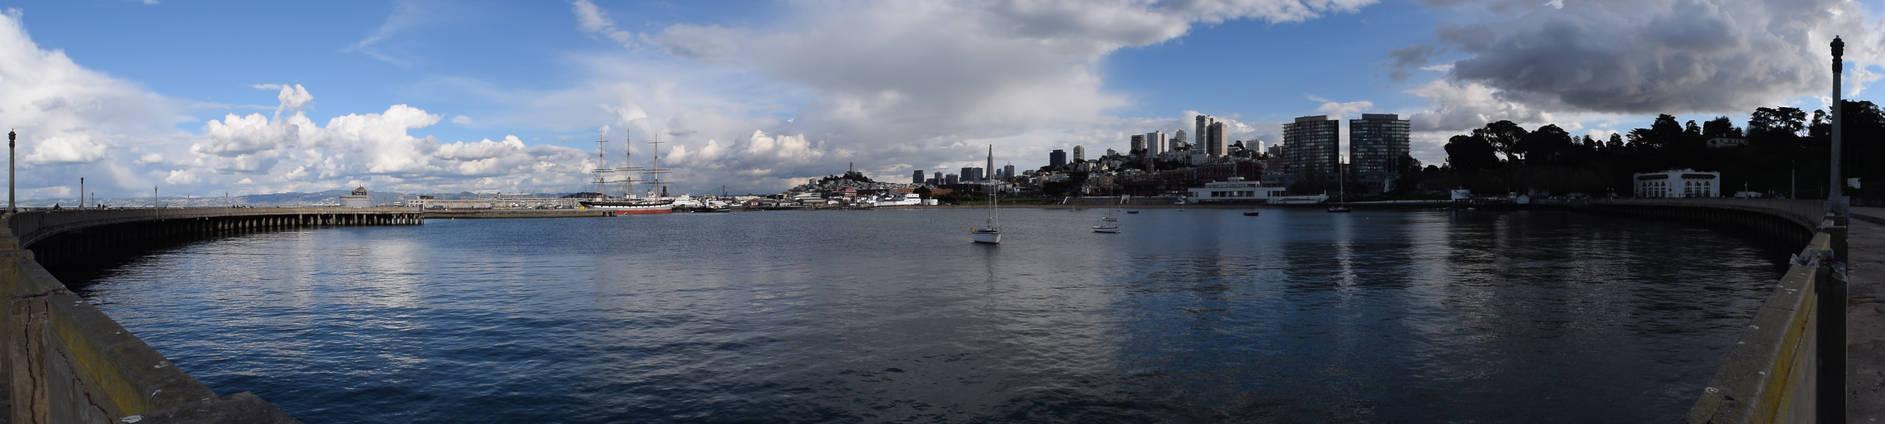 Municipal Pier Panorama by discoinferno84